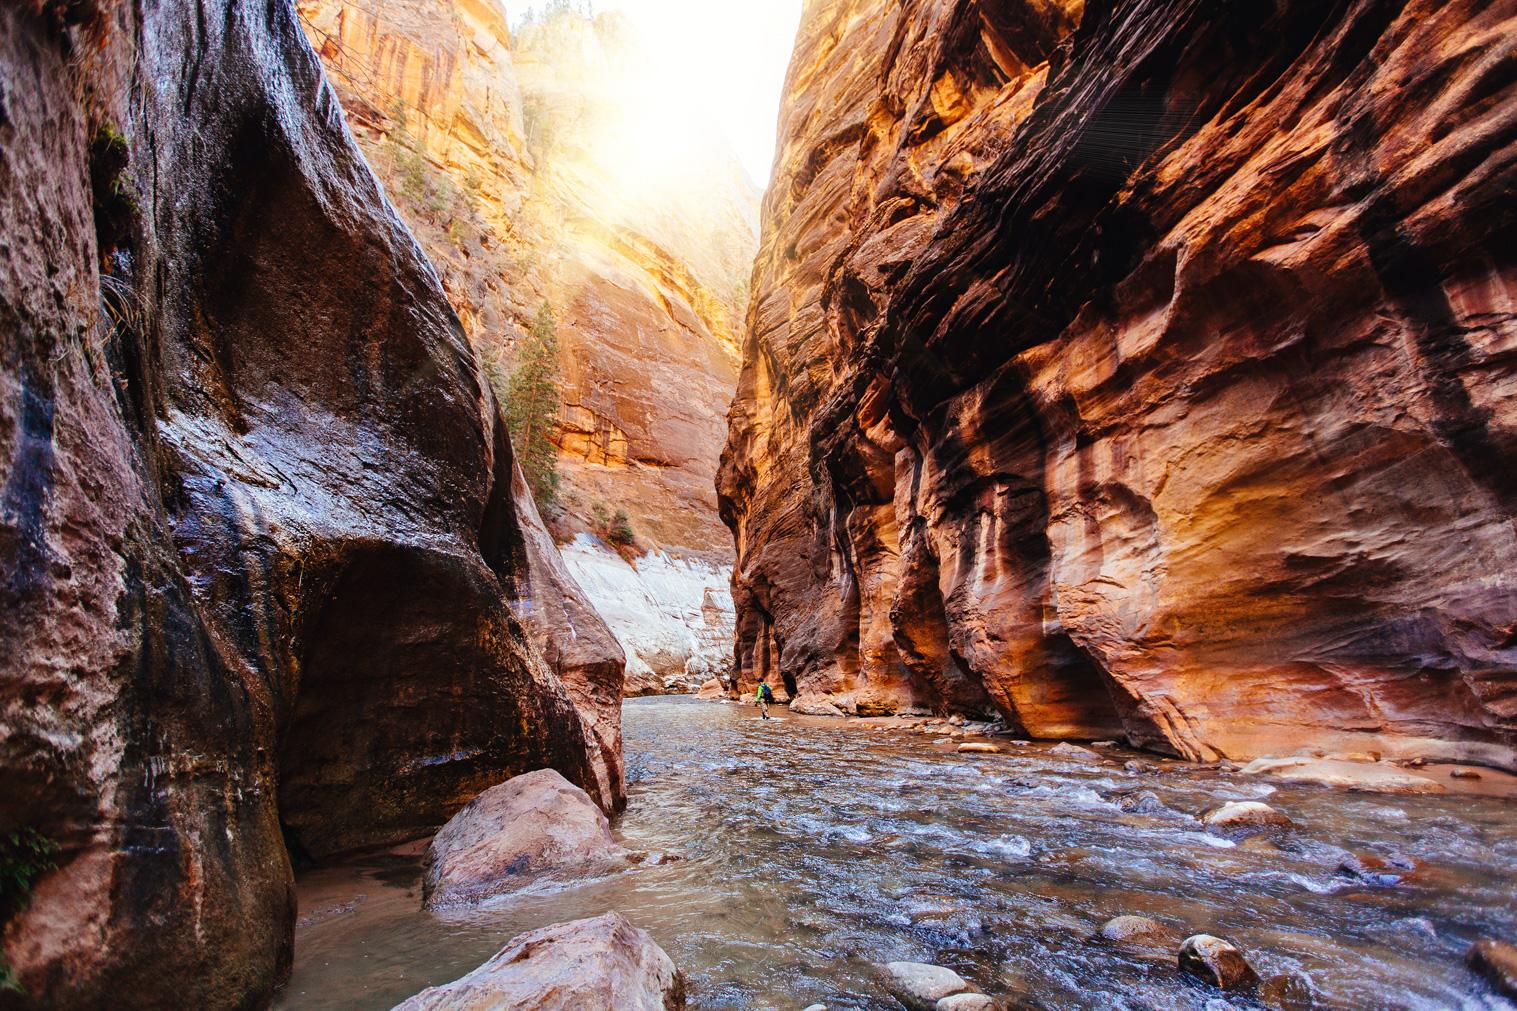 CindyGiovagnoli_Great_Sand_Dunes_Zion_National_Park_Horseshoe_Bend_Truck_Camping_Toyota_The_Narrows_roadtrip_Utah_Colorado-001.jpg